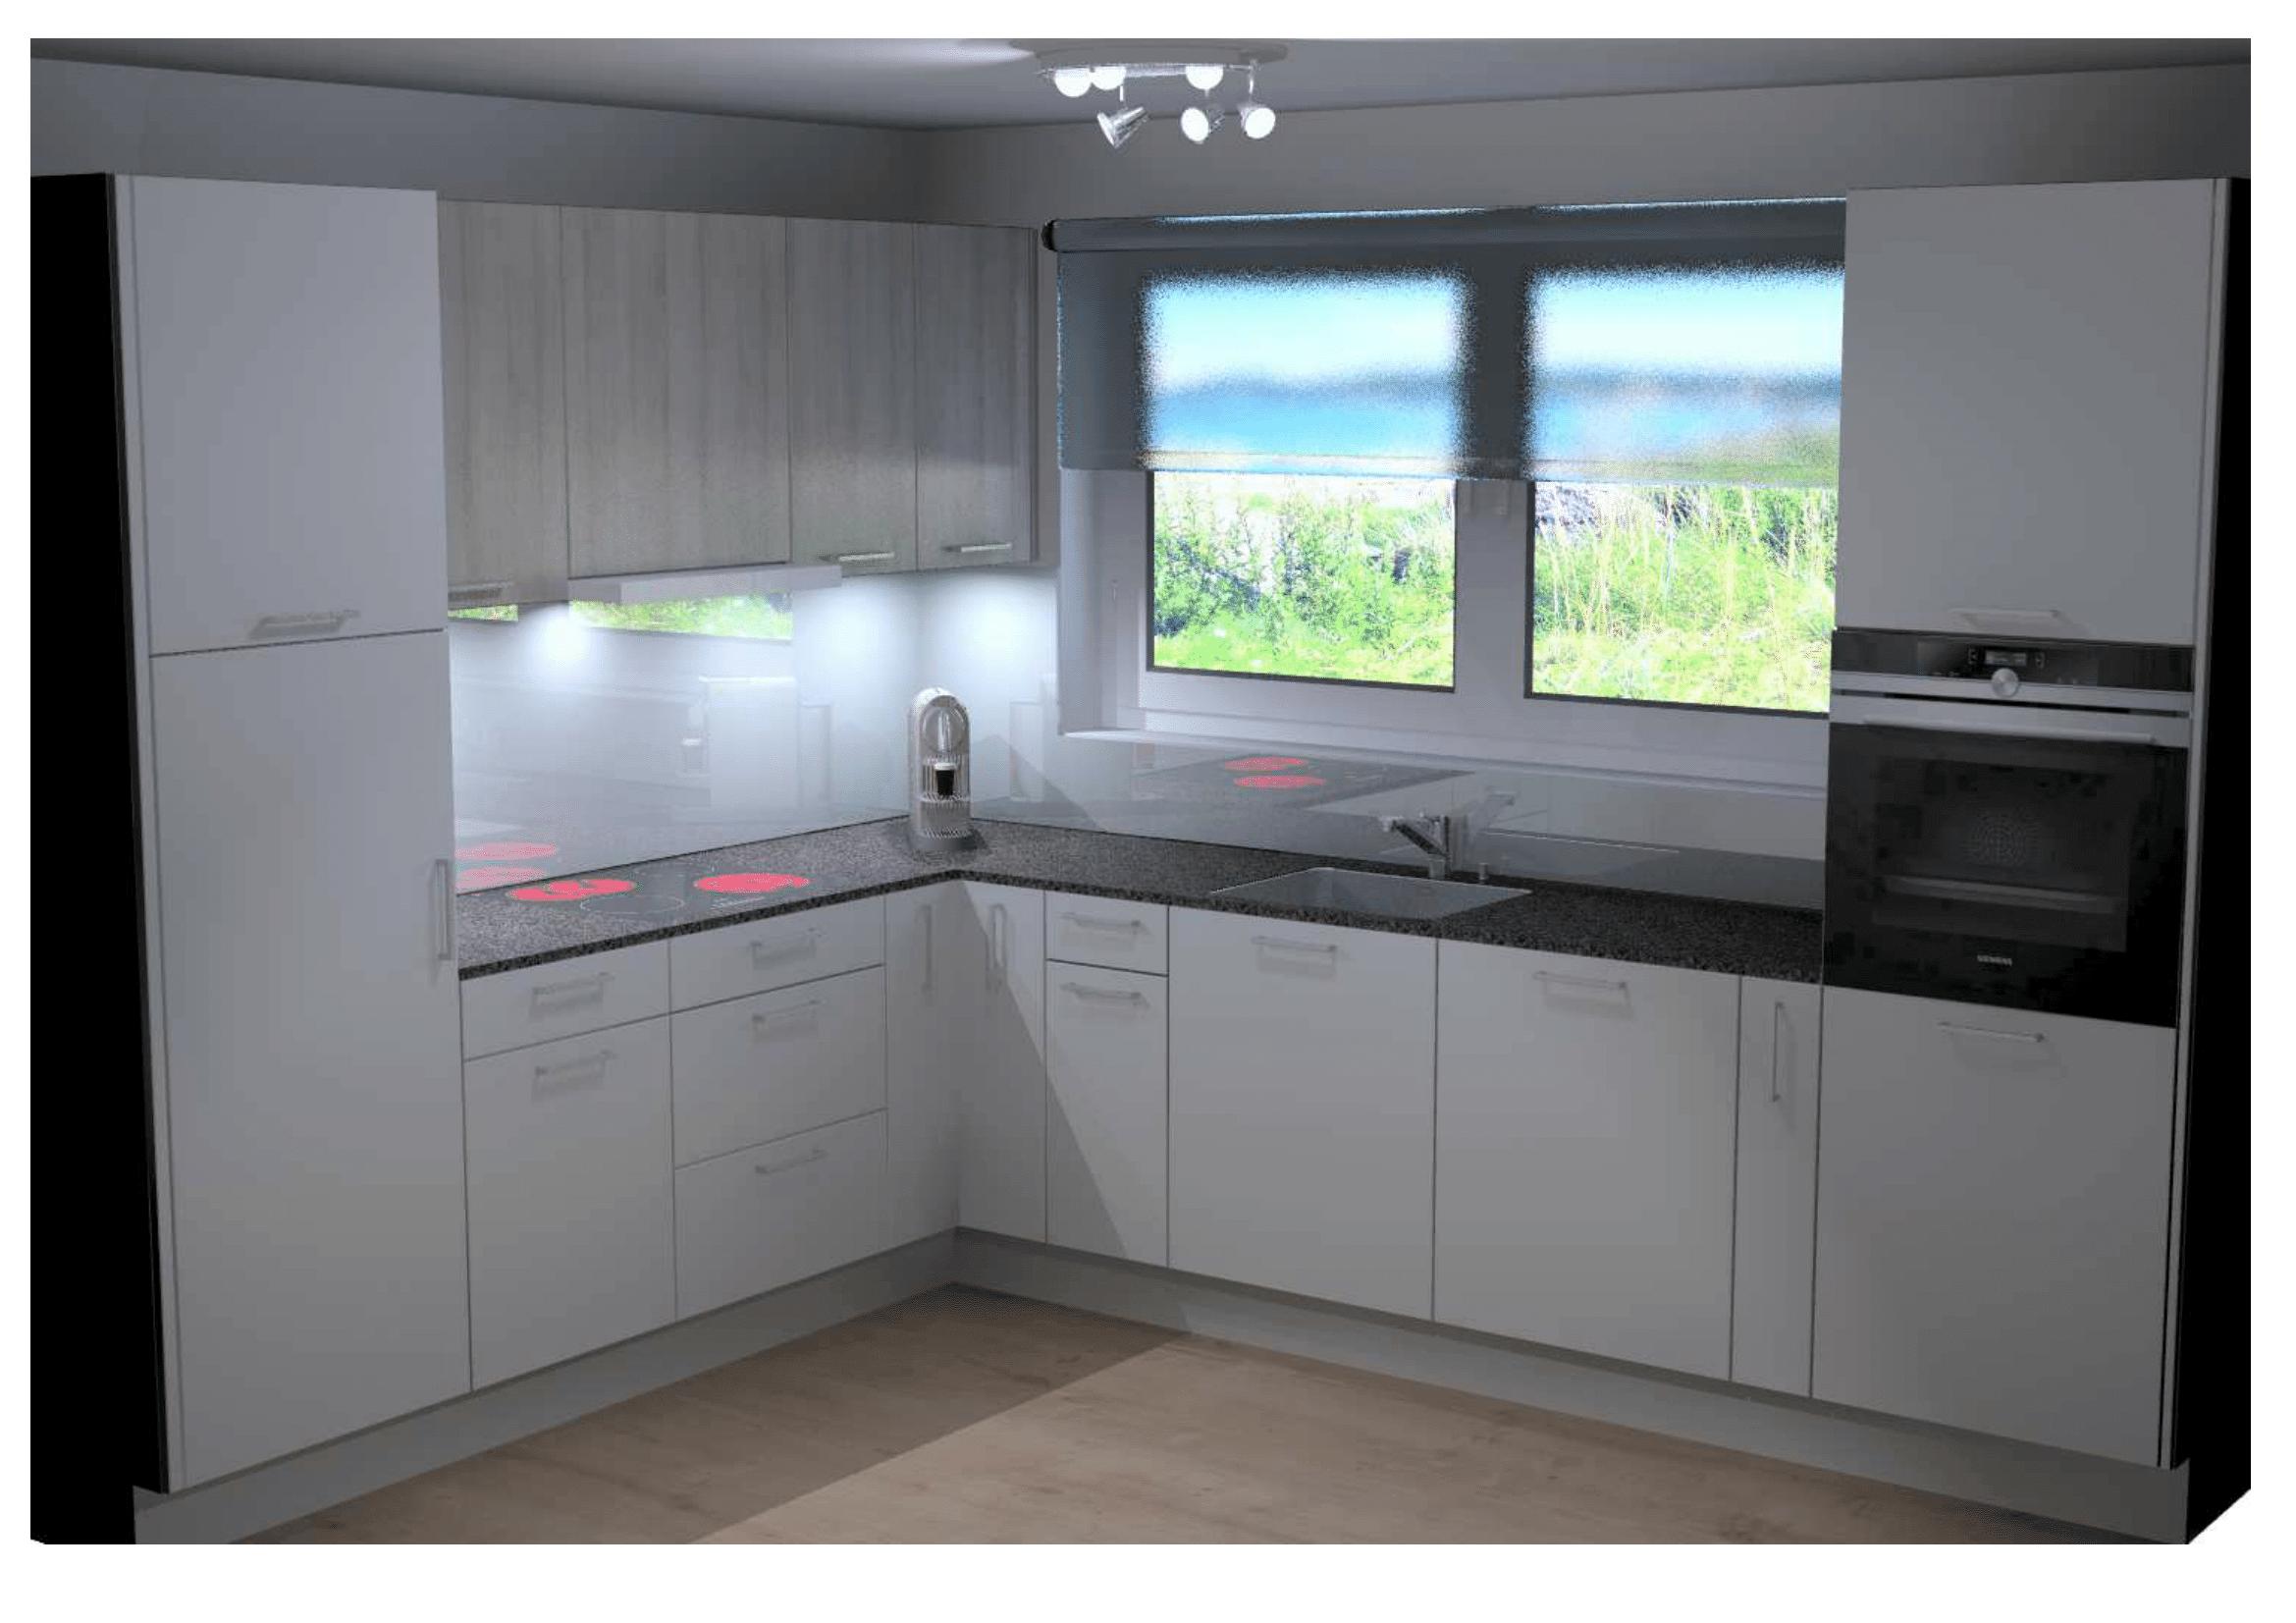 Full Size of Küche Ohne Elektrogeräte Kaufen Küche Ohne Elektrogeräte Kaufen Sinnvoll Was Kostet Eine Küche Ohne Elektrogeräte Roller Küche Ohne Elektrogeräte Küche Küche Ohne Elektrogeräte